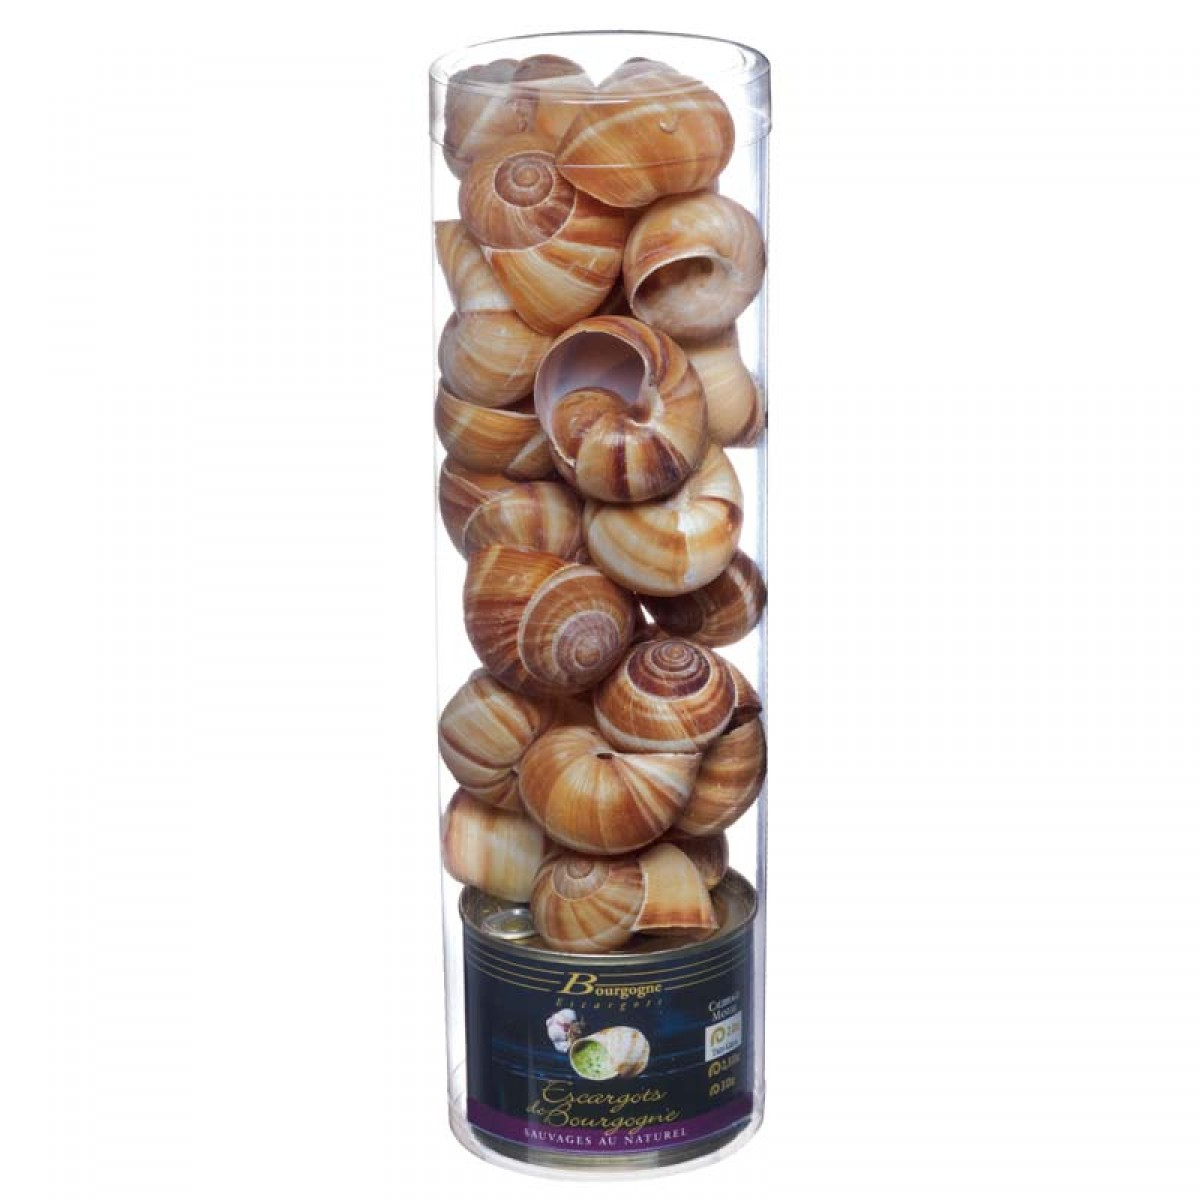 escargots de bourgogne moyens bo te 1 4 3dz avec coquilles 115g bourgogne escargots saveurs. Black Bedroom Furniture Sets. Home Design Ideas